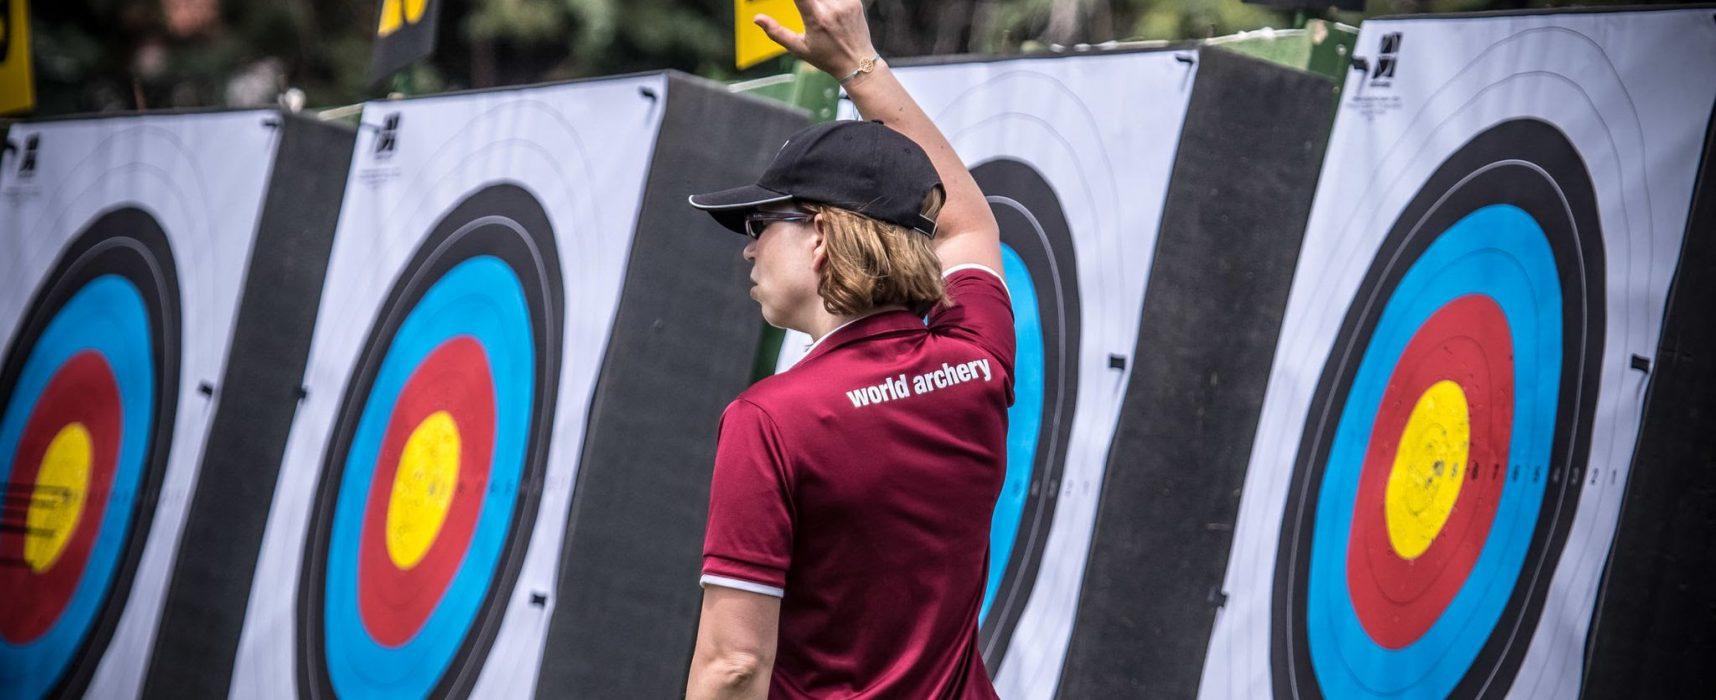 World Archery: Αναβάλλονται όλοι οι αγώνες τοξοβολίας έως τις 30 Απριλίου